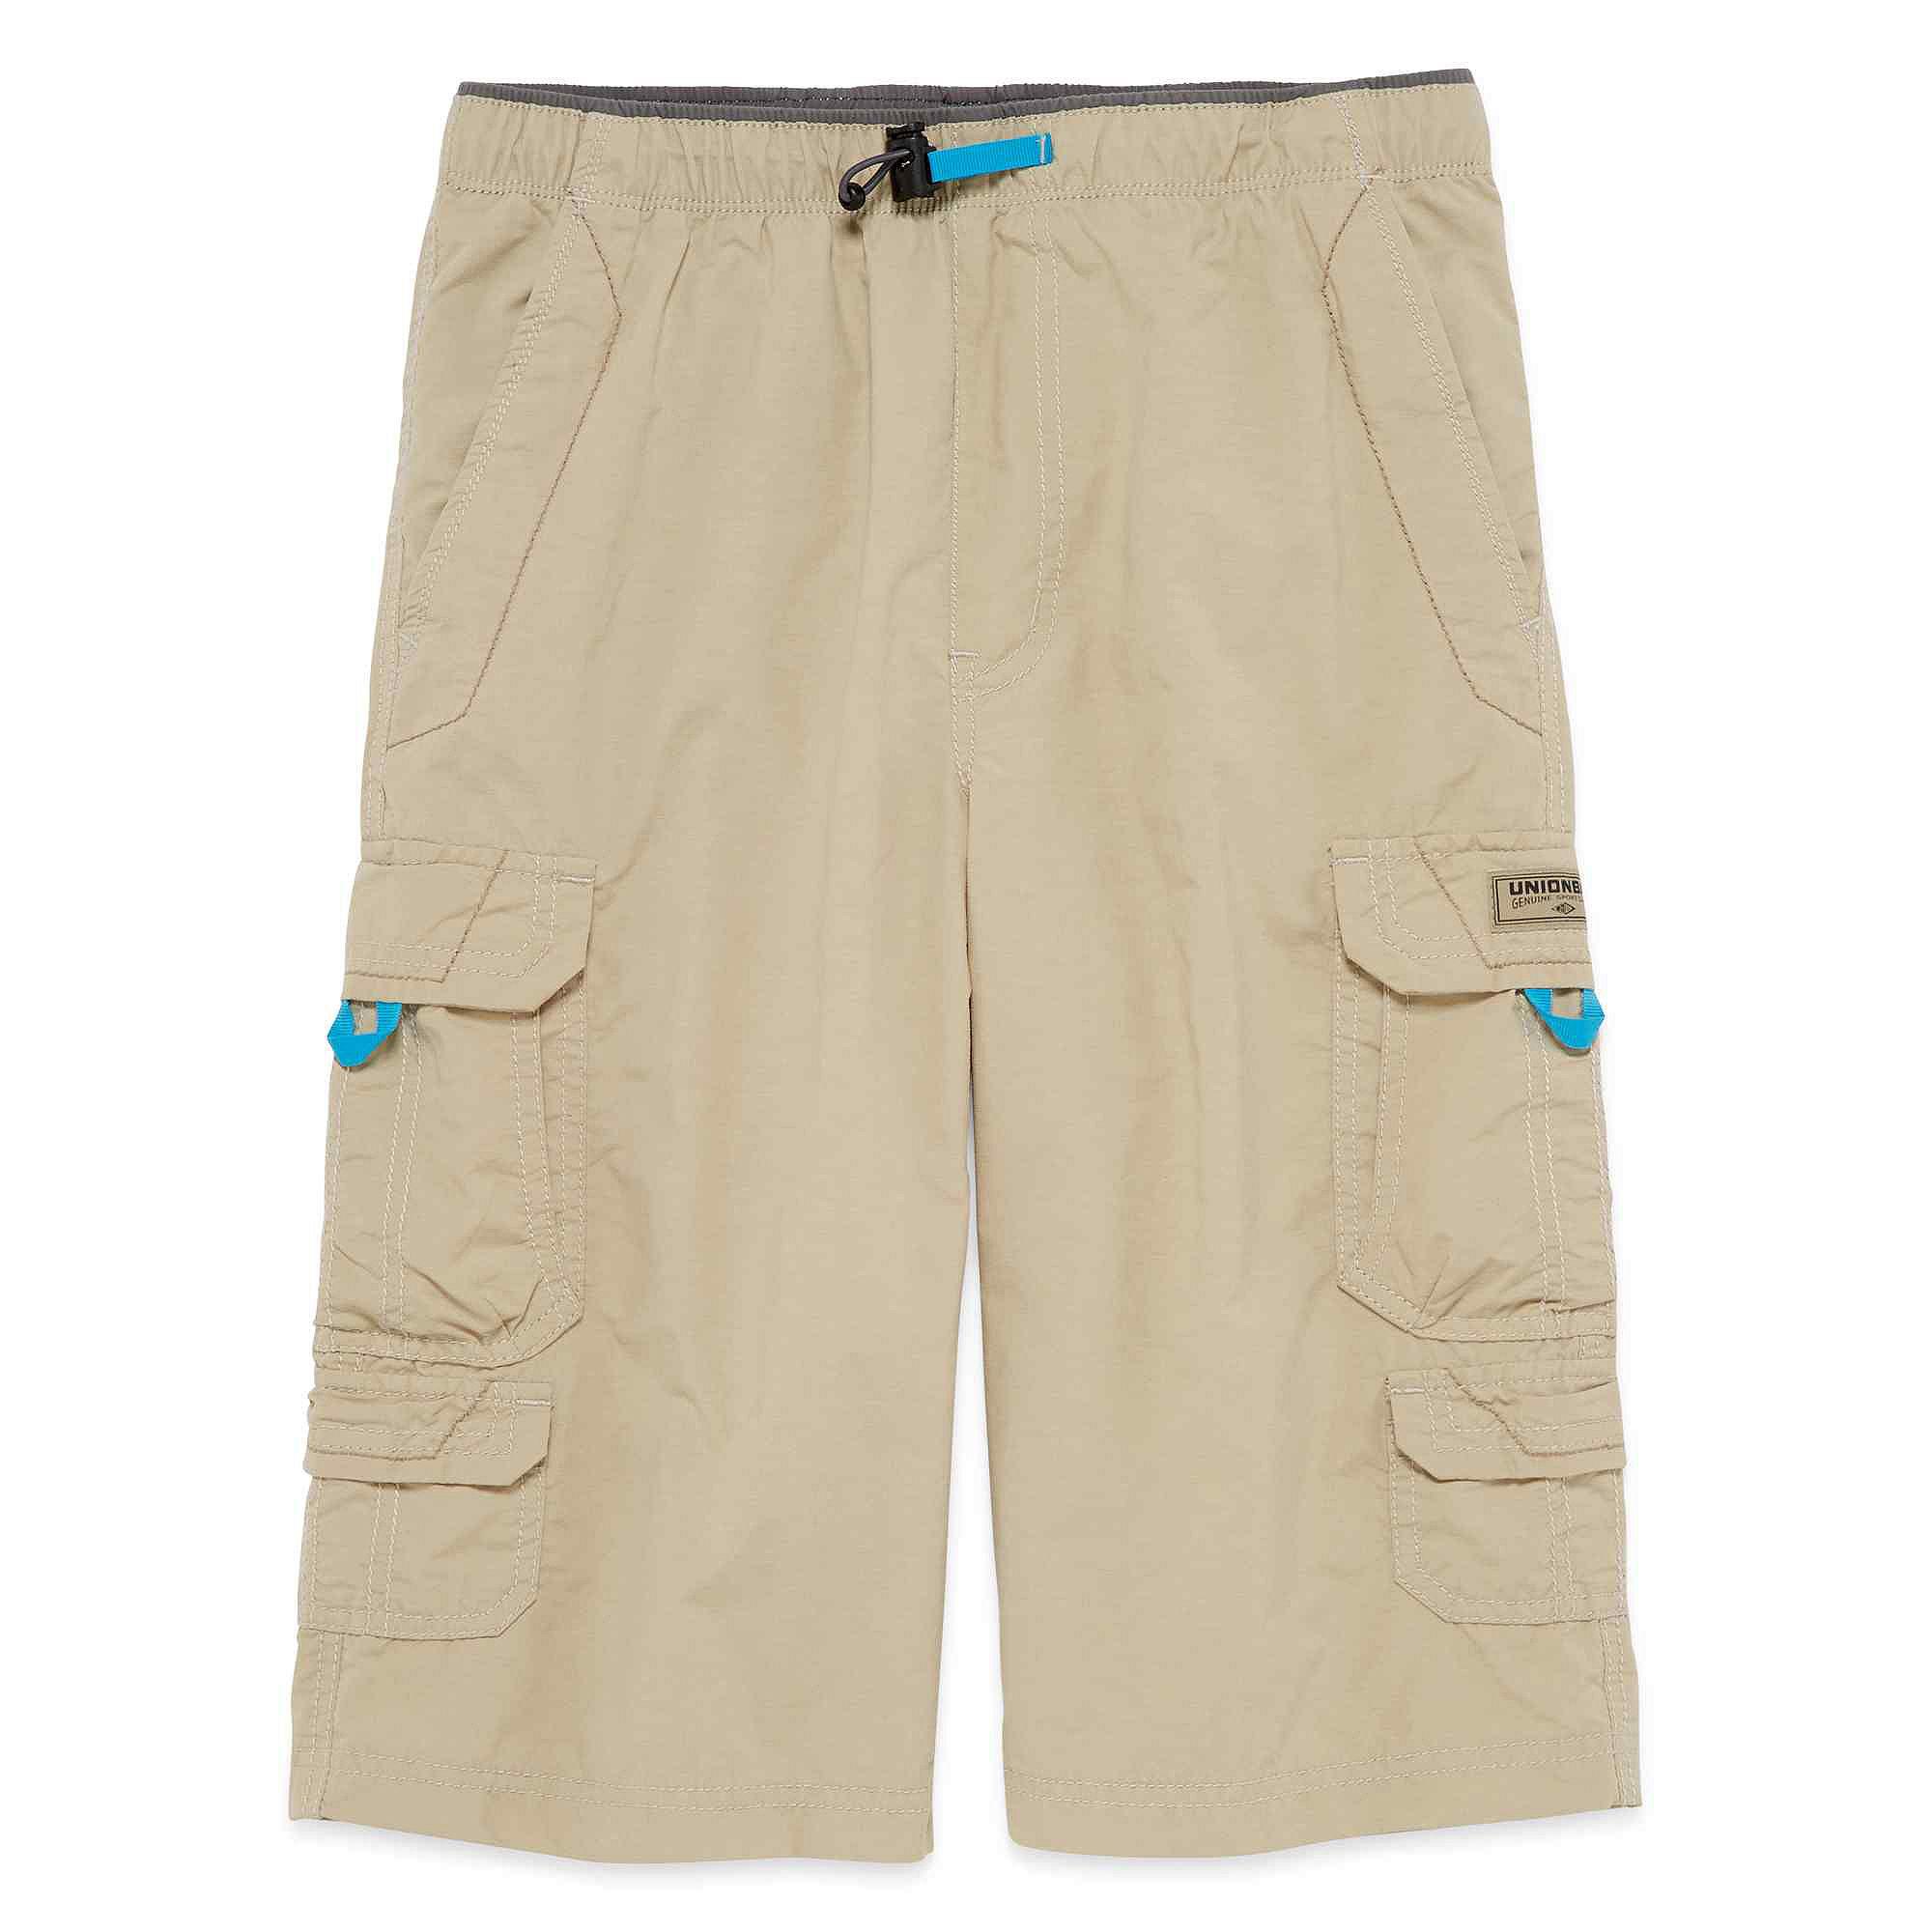 UNIONBAY Brooks Cargo Shorts - Boys 8-20